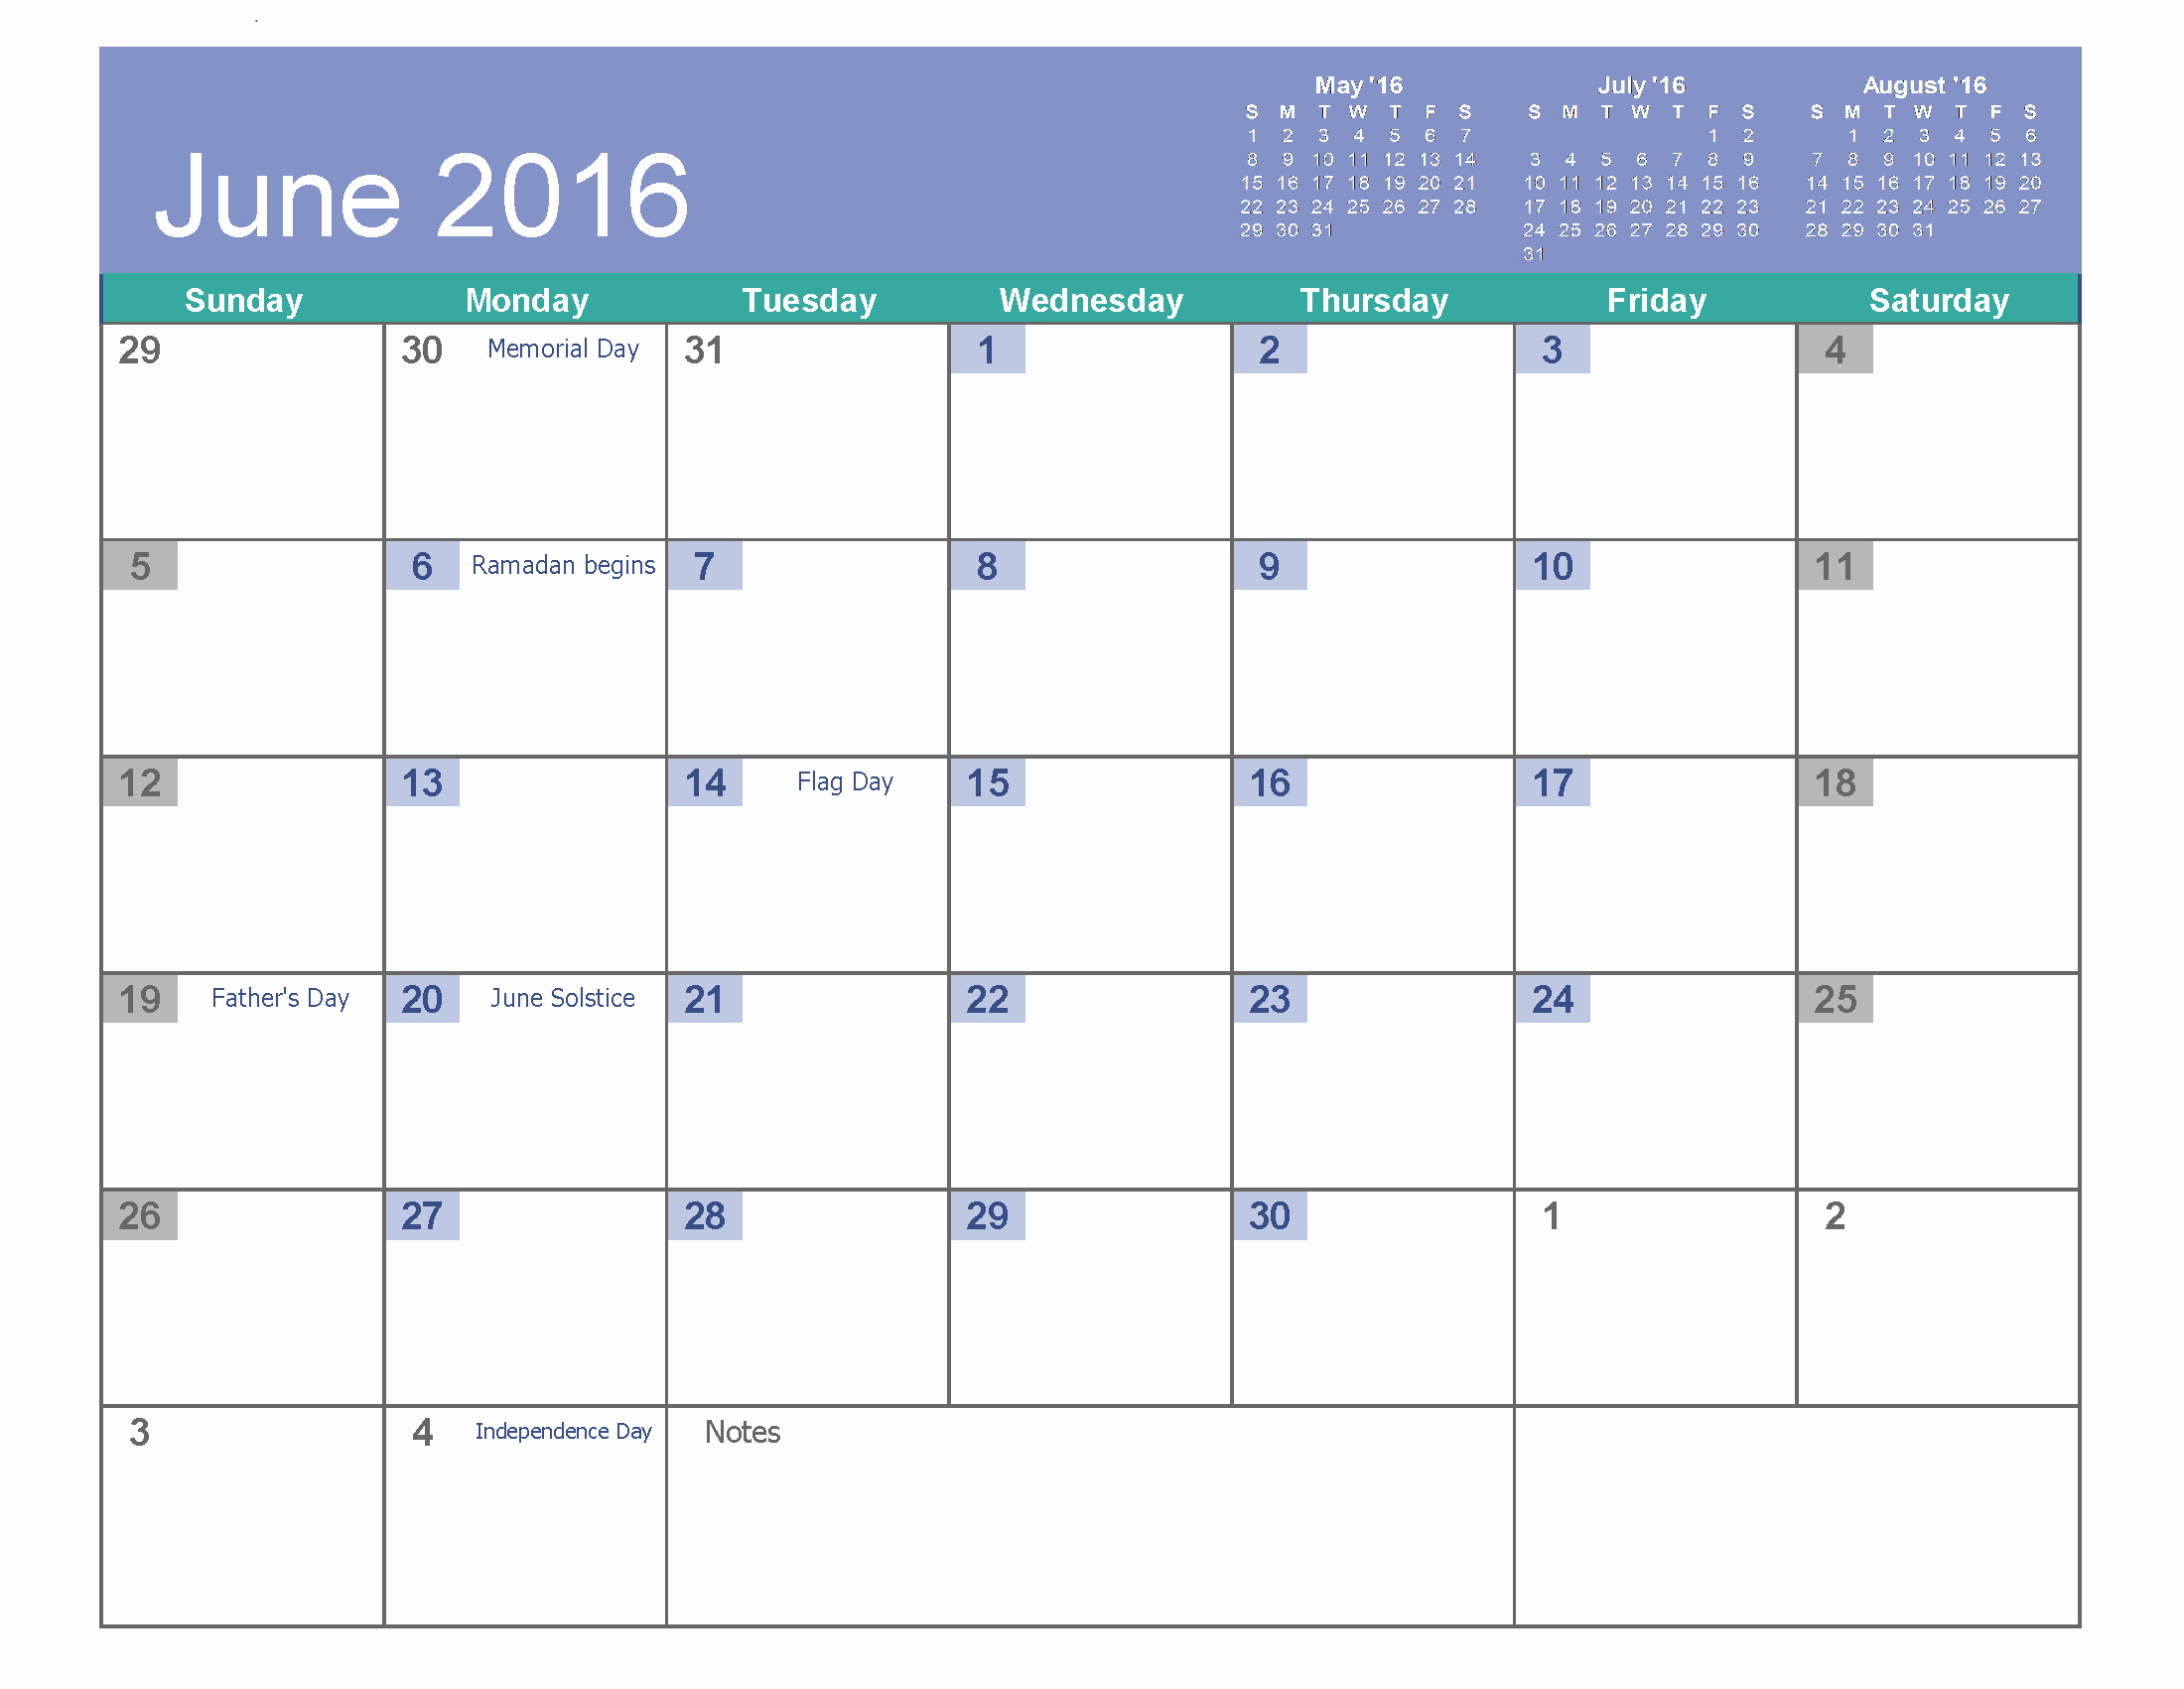 Blank Calendar Template 2016 Fresh June 2016 Printable Calendar Landscape A4 Portrait